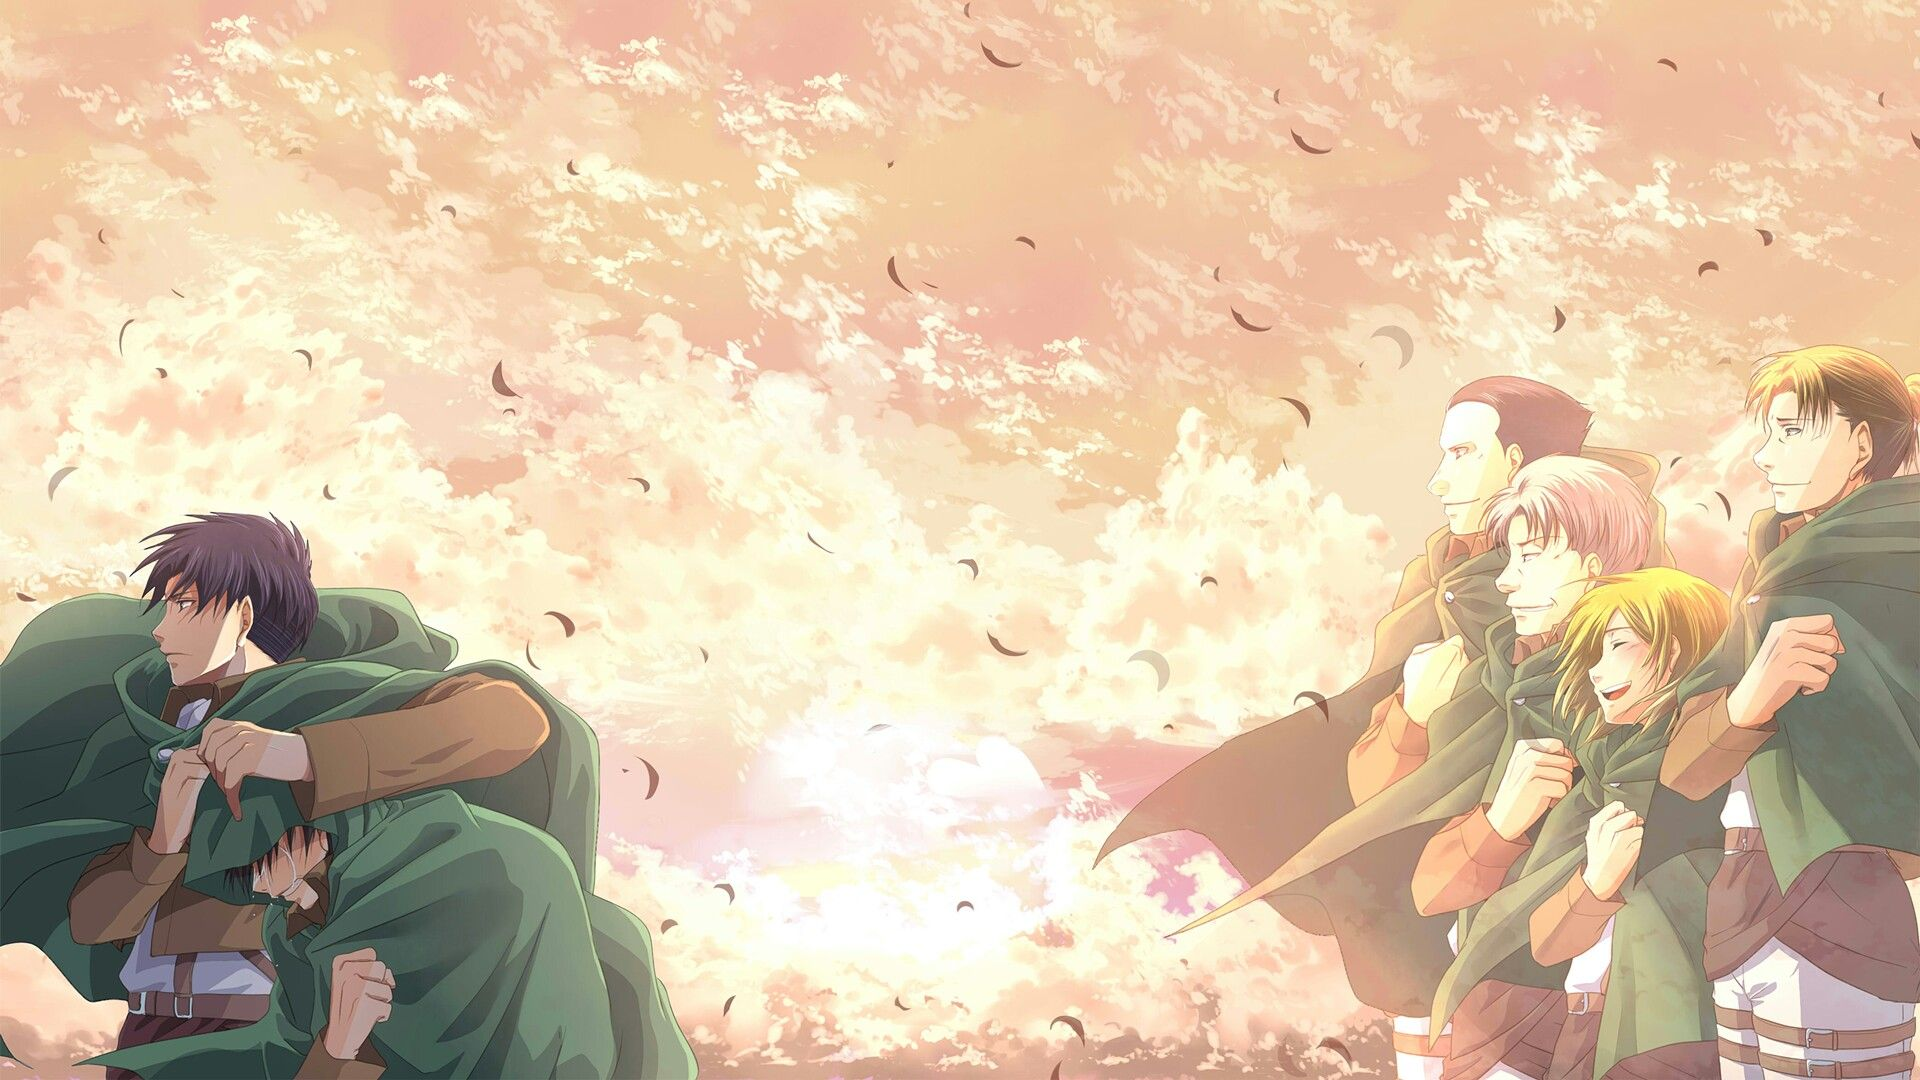 Pin By Nyyoro On Shingeki No Kyojin Attack On Titan Attack On Titan Anime Attack On Titan Fanart